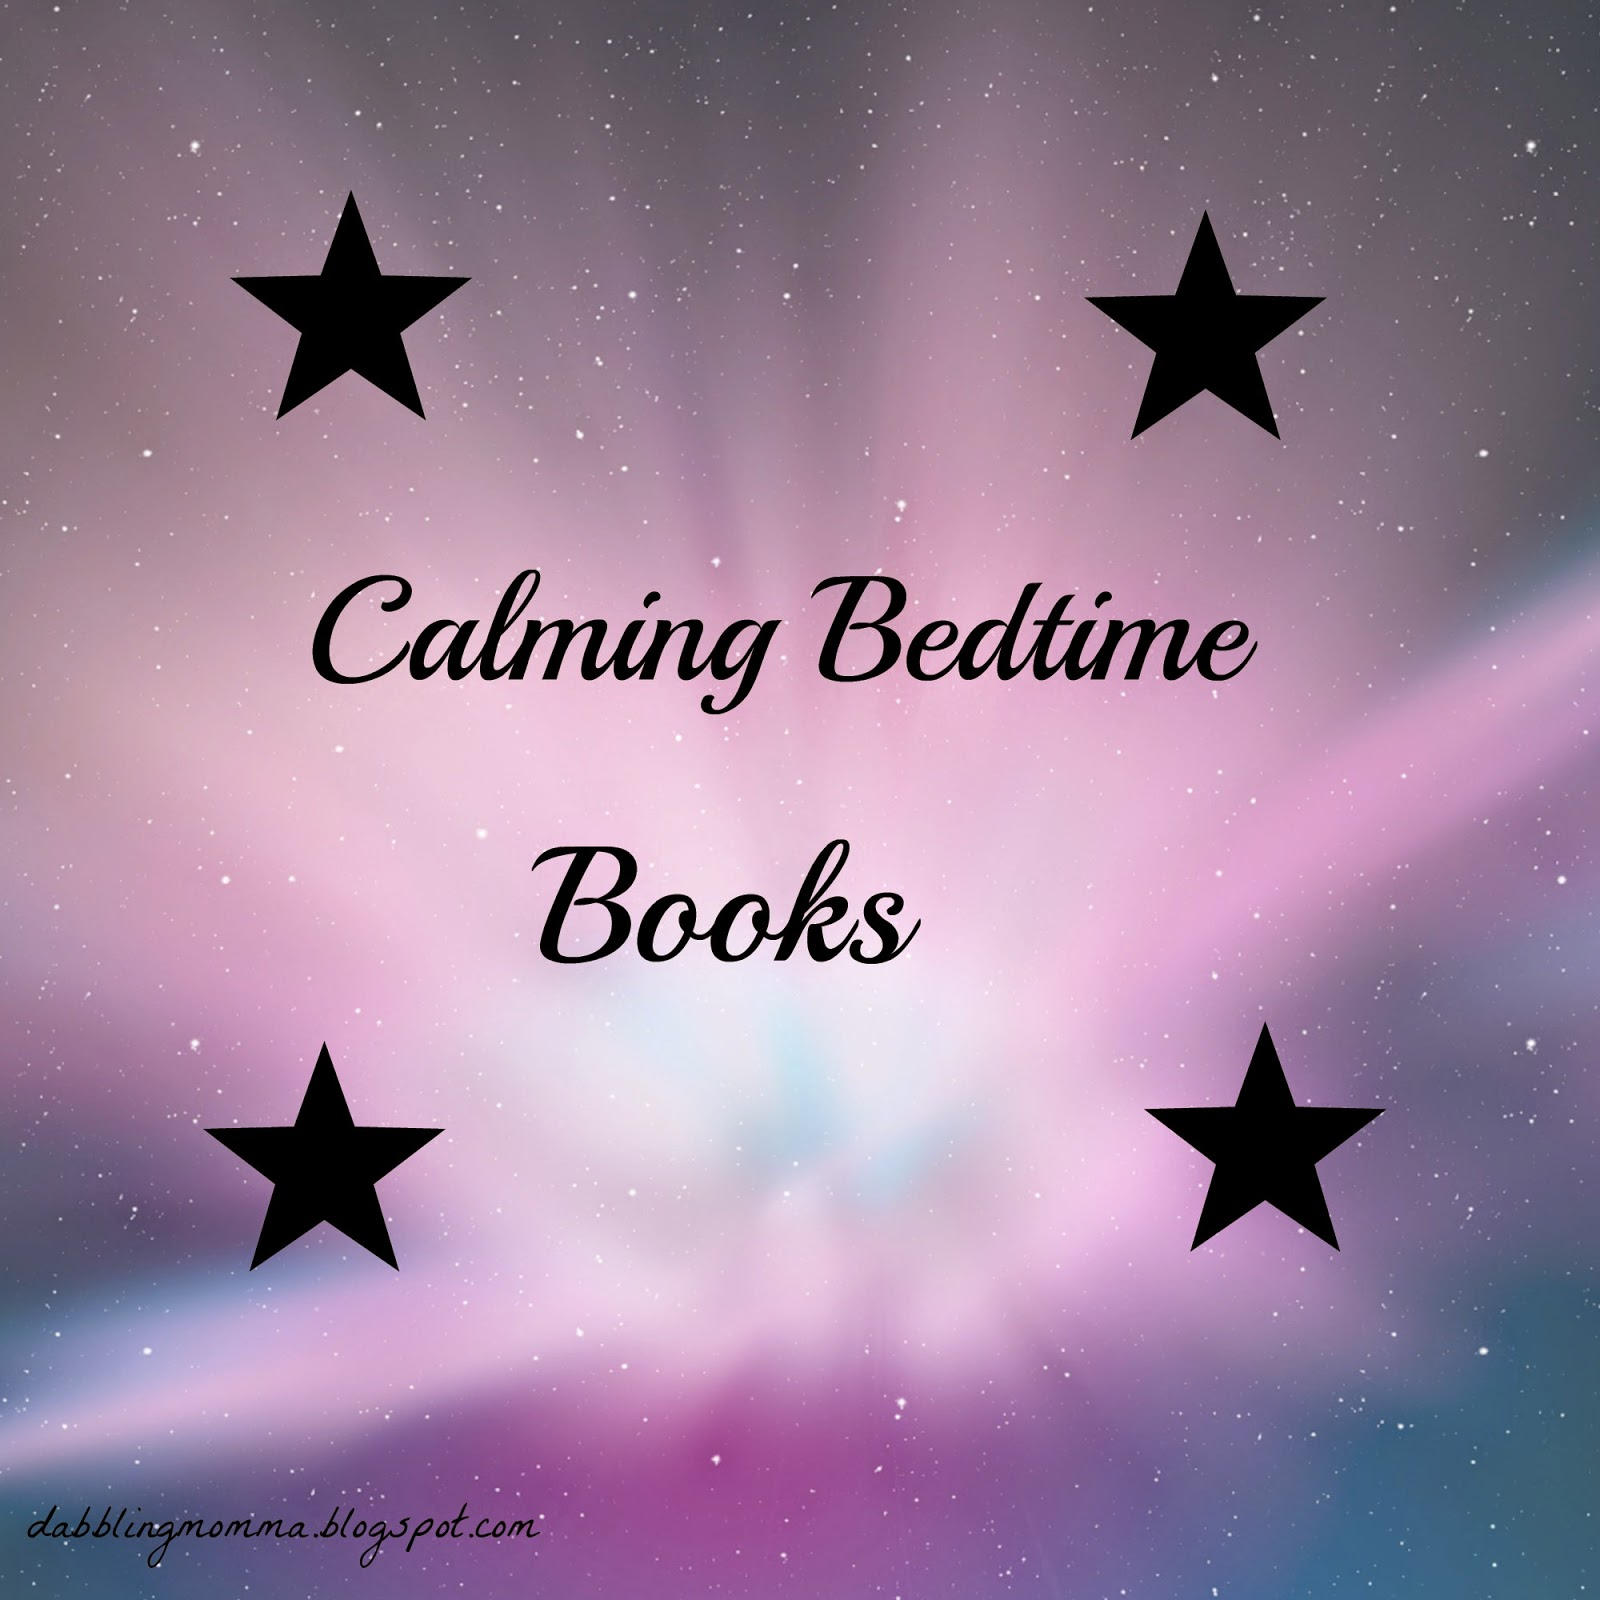 Calming Bedtime Books